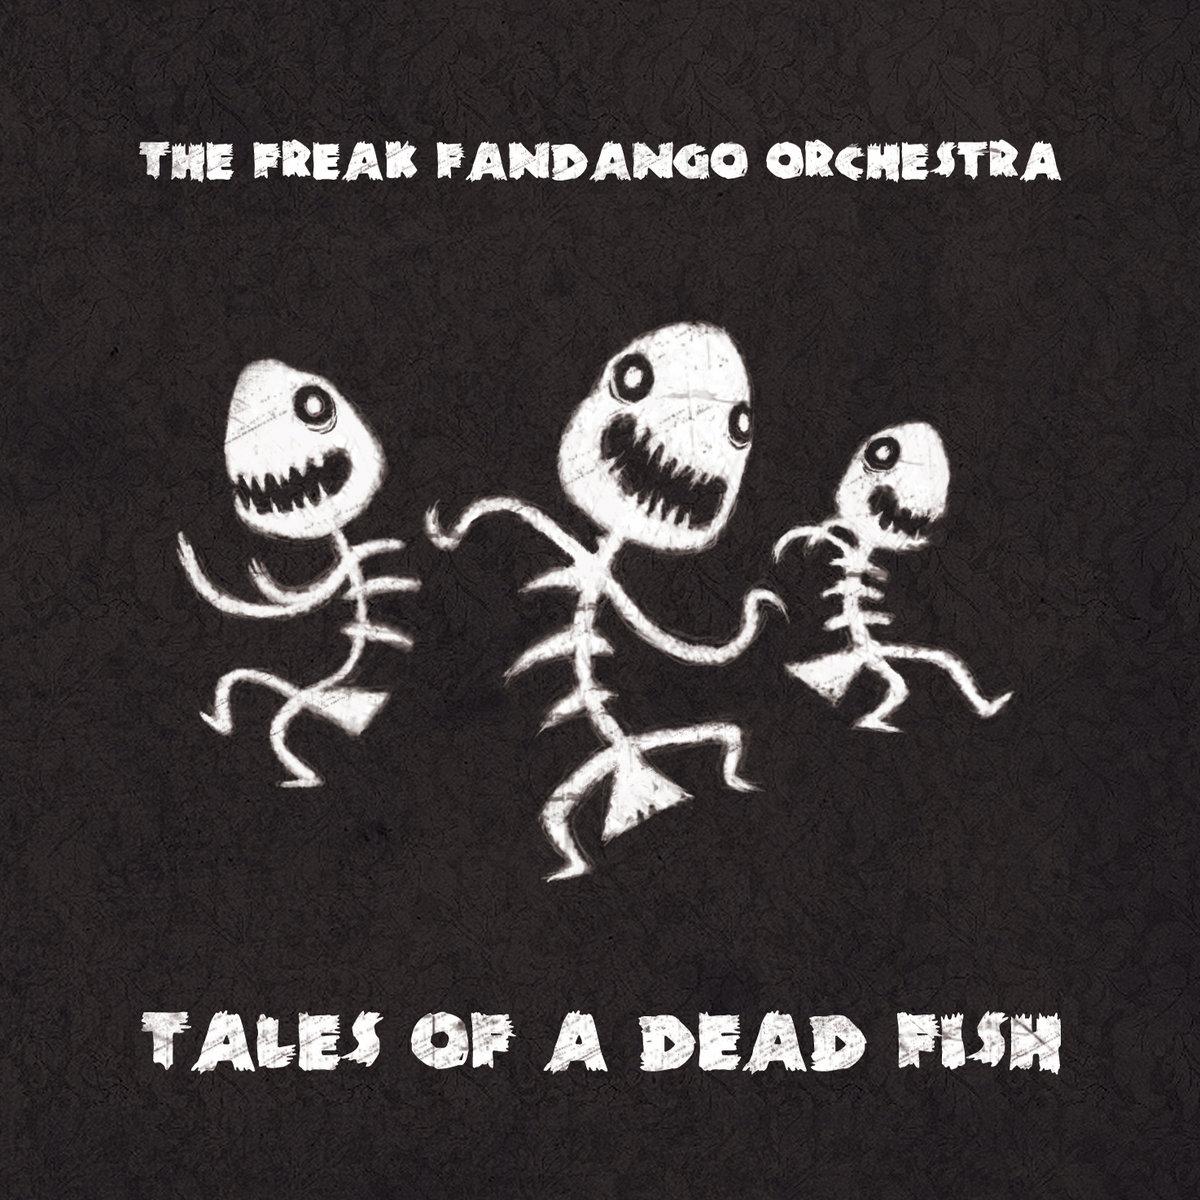 The Freak Fandango Orchestra – Tales of a dead fish